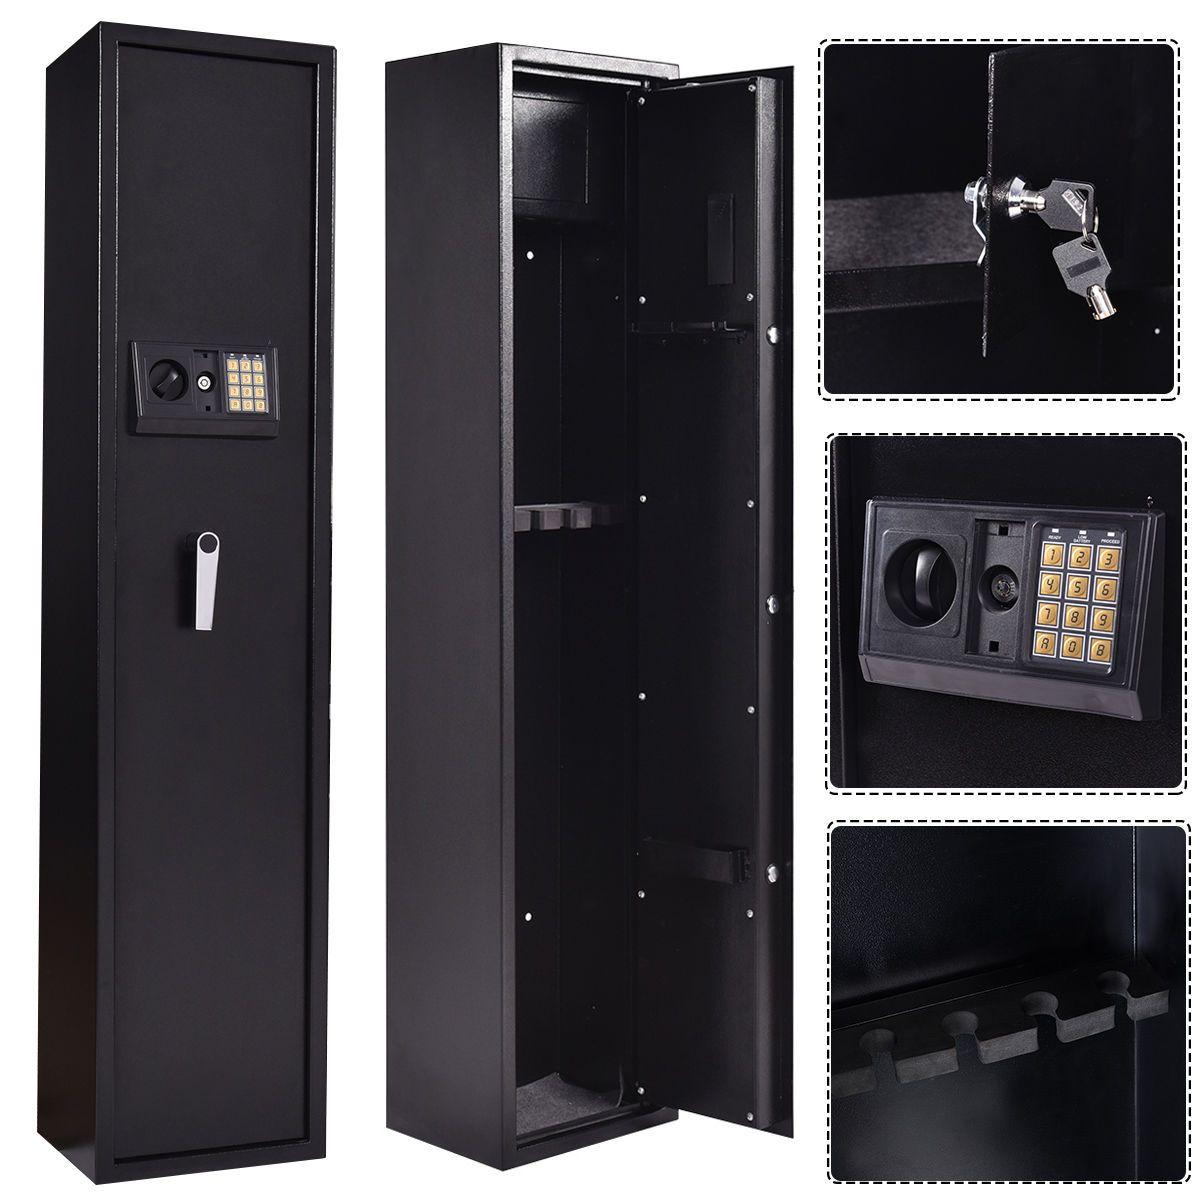 Giantex New 5 Rifle Electronic Lock Gun Storage Safe Cabinet Modern Steel Digital Security Safe Lockbox Gun Case HW53780